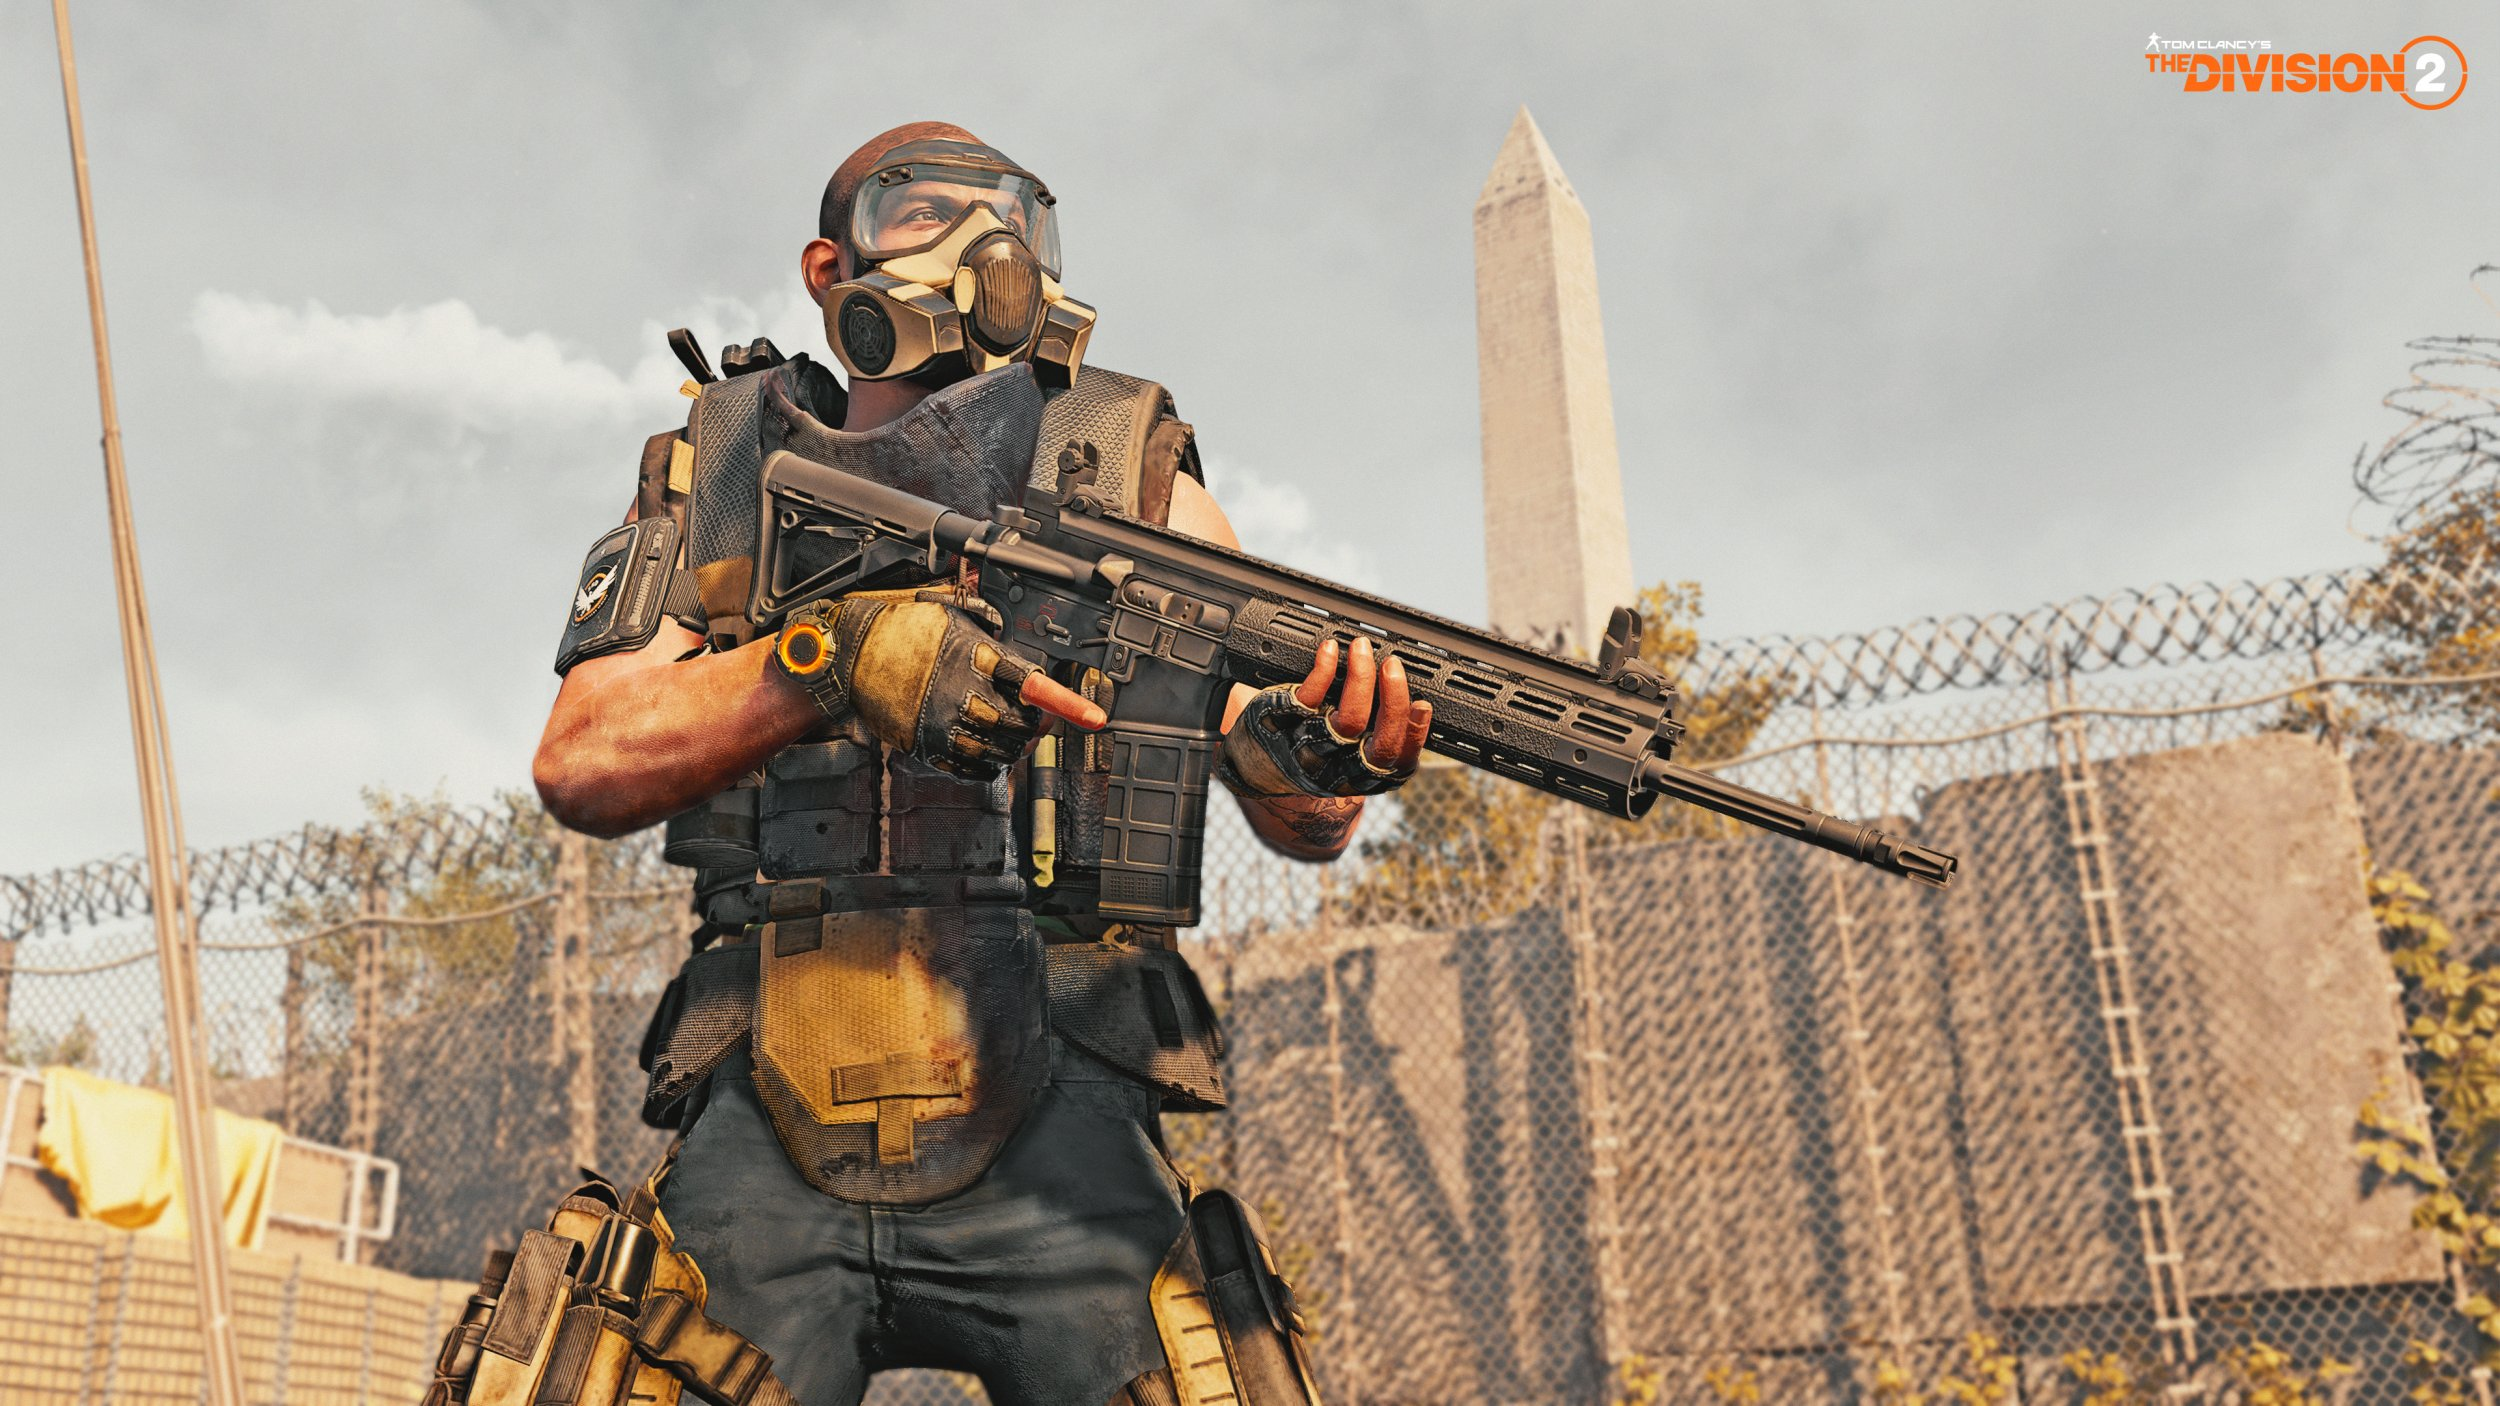 Division 2' Update 1 06 Fixes T-Posing & True Patriot Gear